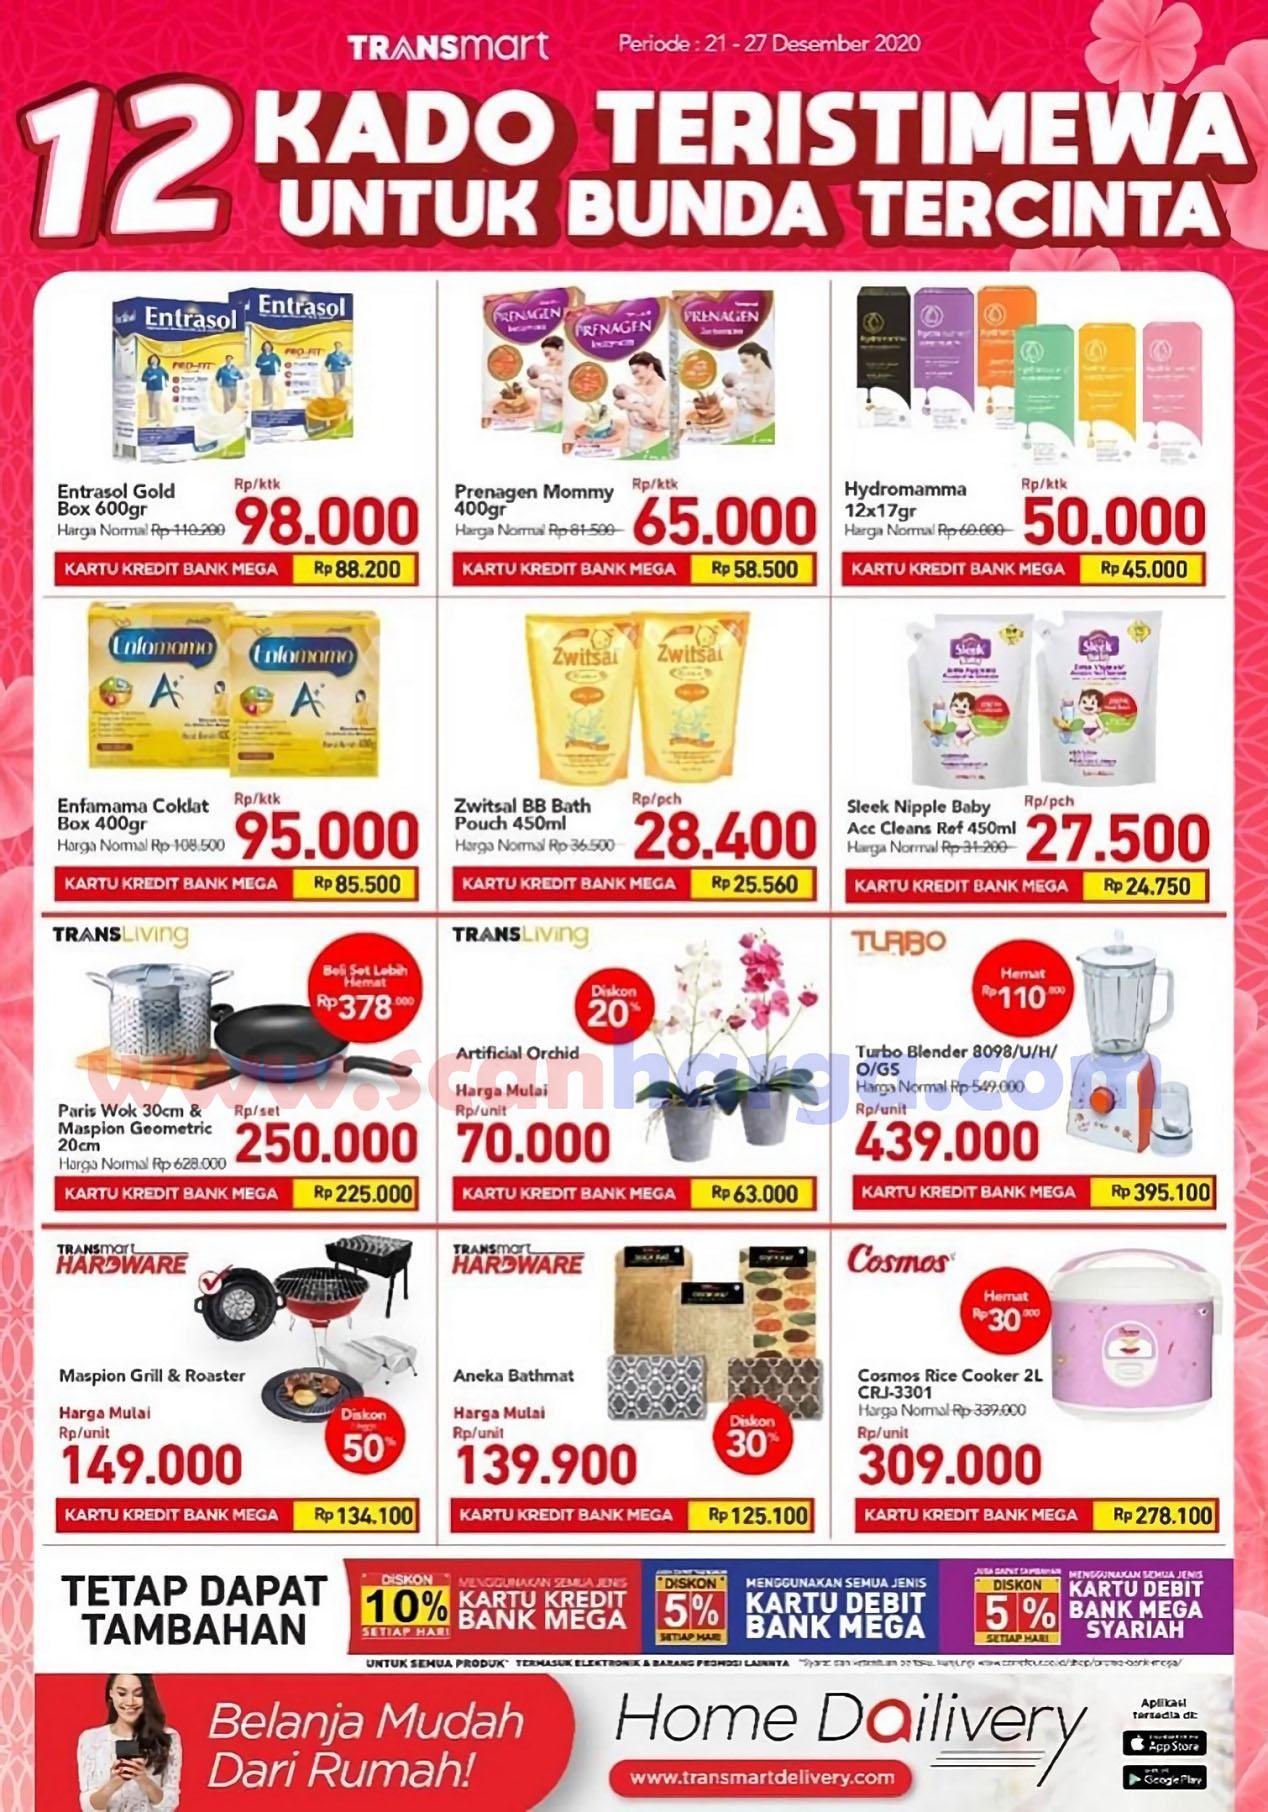 Transmart Carrefour Promo Kado Istimewa Untuk Bunda – Diskon Spesial HARI IBU